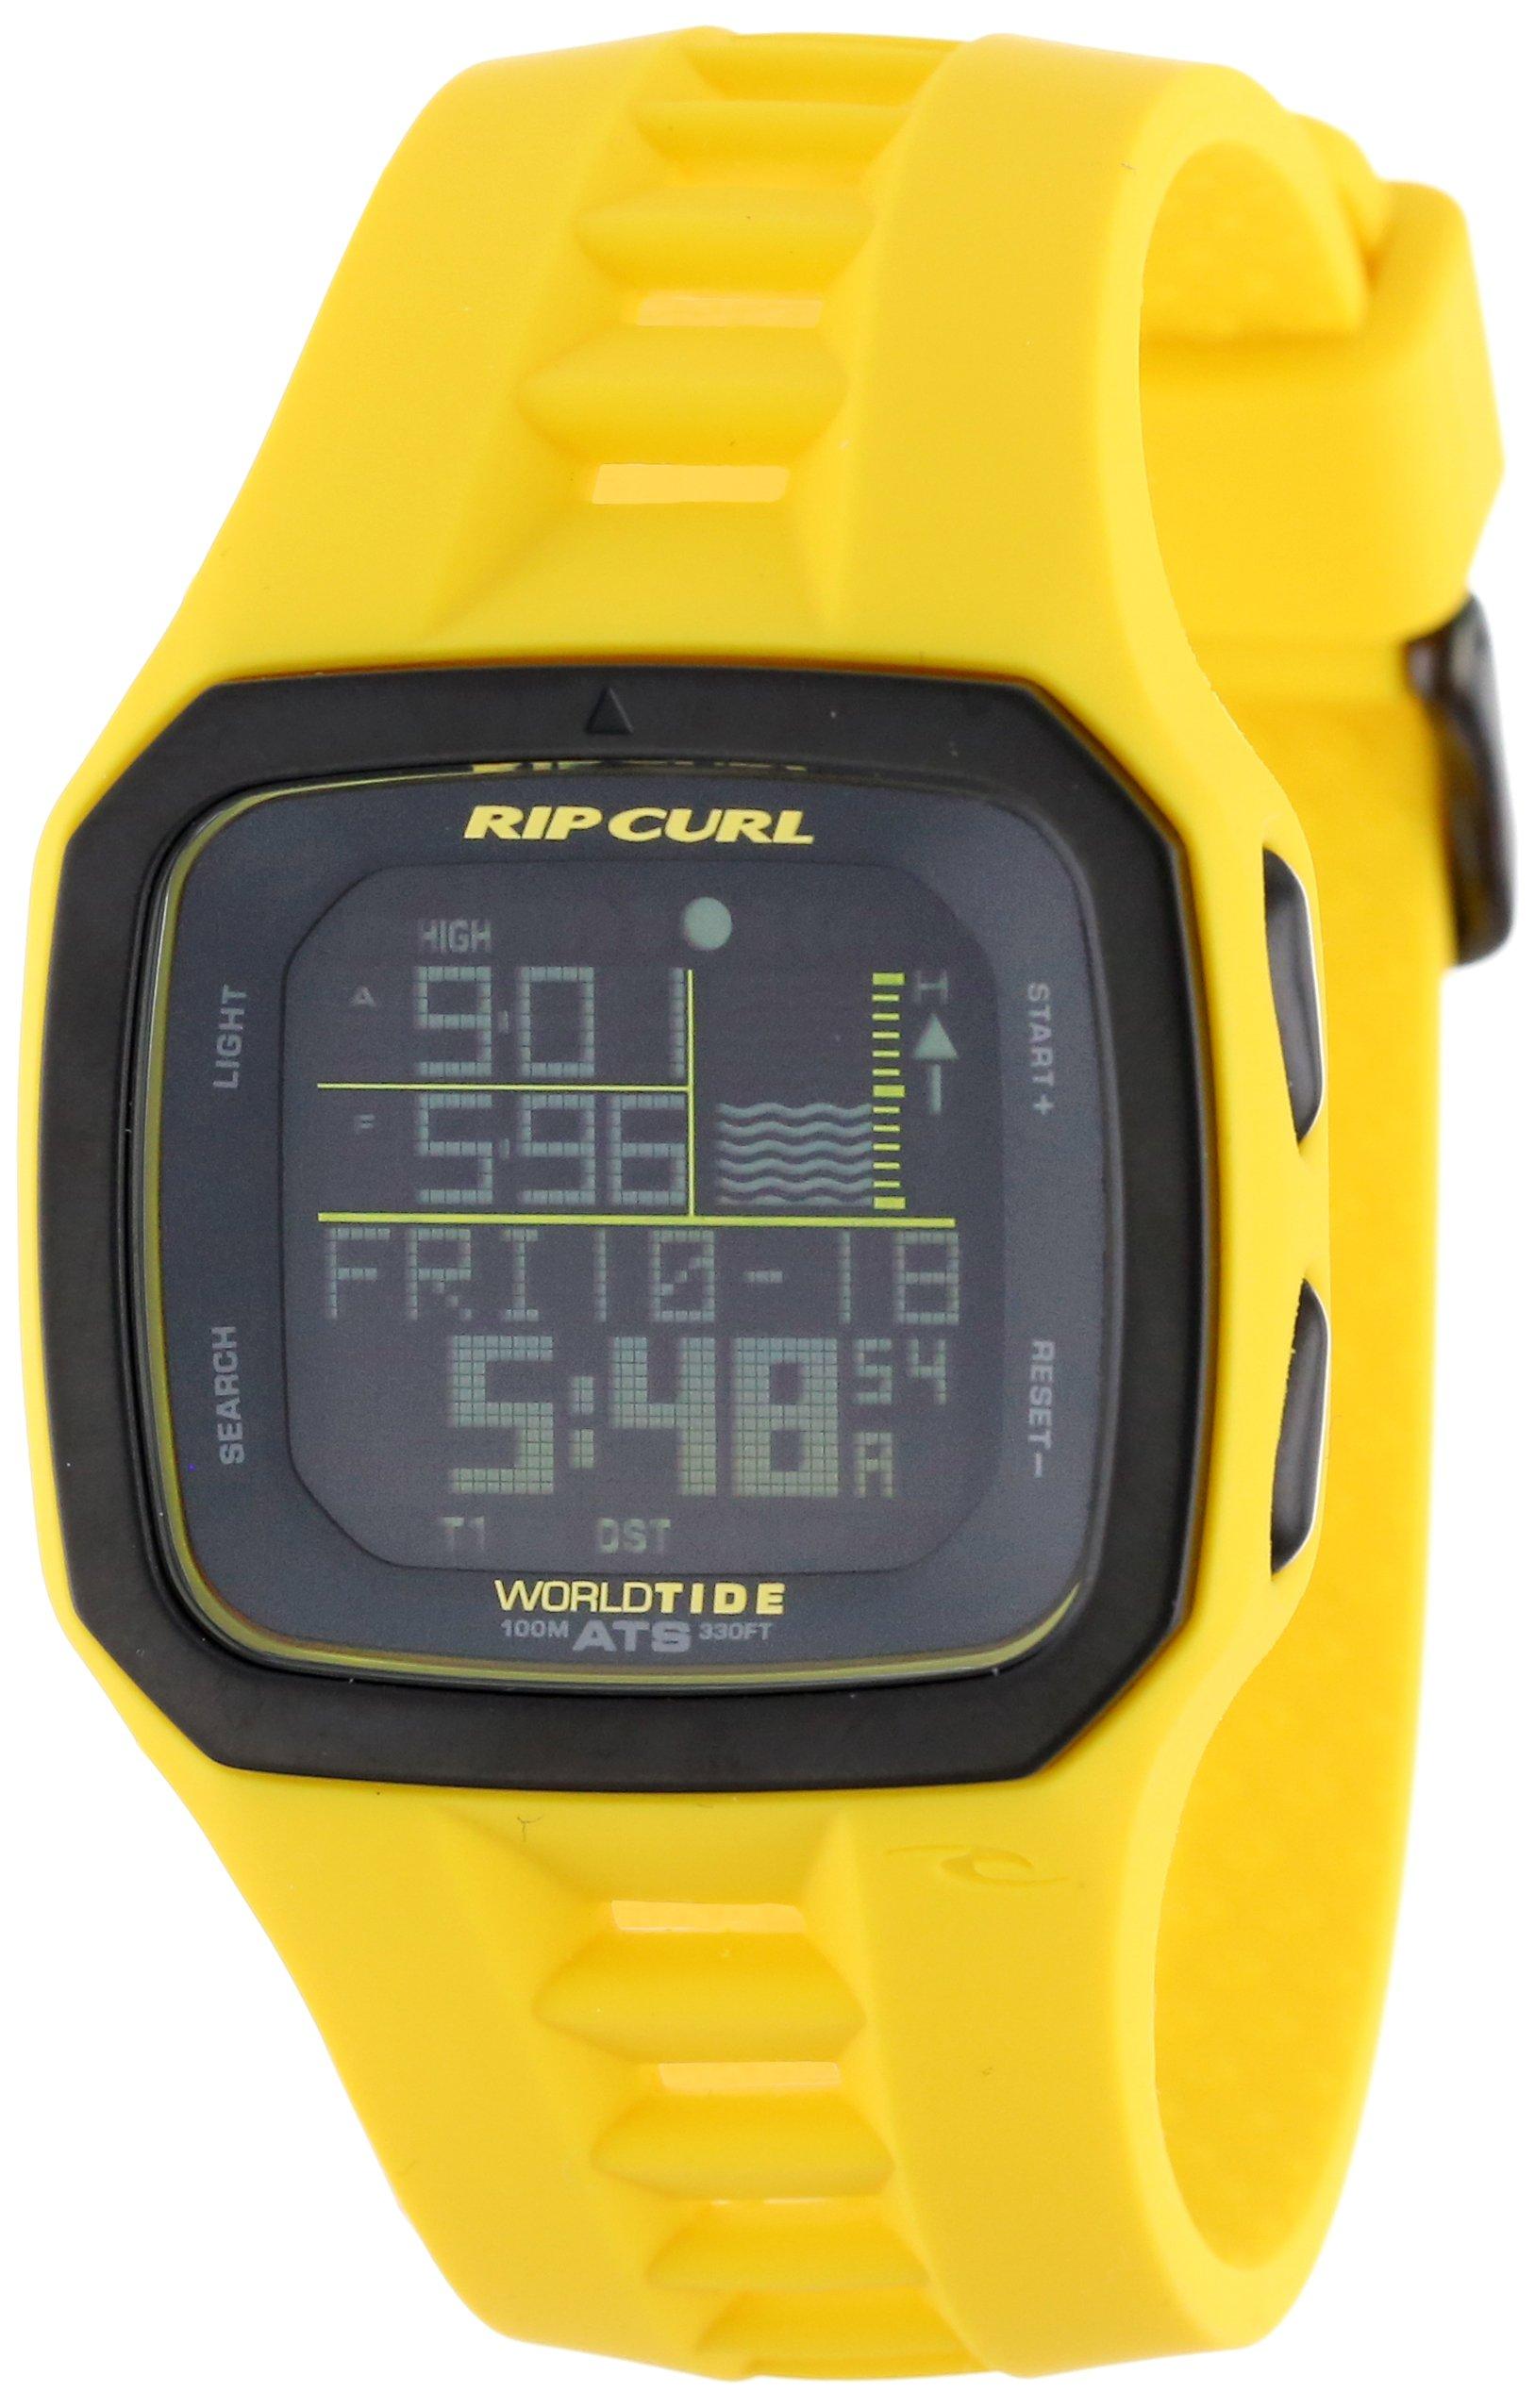 Rip Curl Men's A1090 - FLY Trestles Pro World Tide Fluorescent Yellow Digital Tide Surf Watch